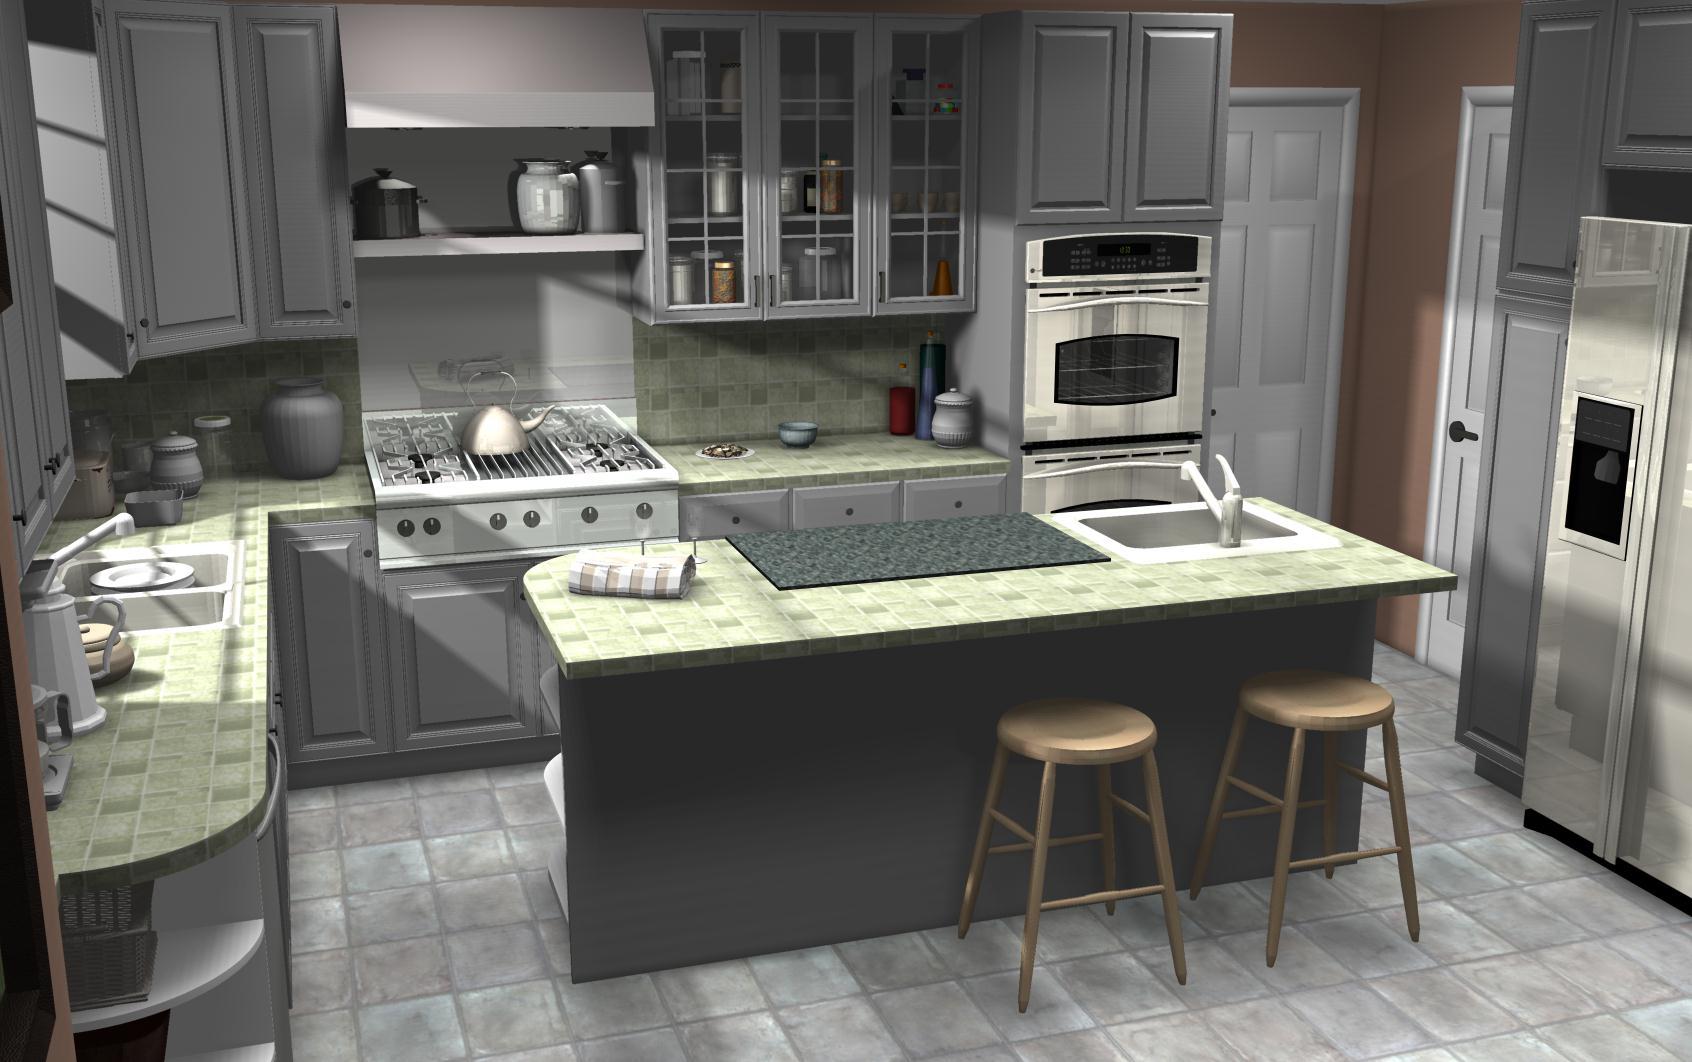 famous kitchens get the look mrs doubtfire movie homes gray kitchen floor IKEA